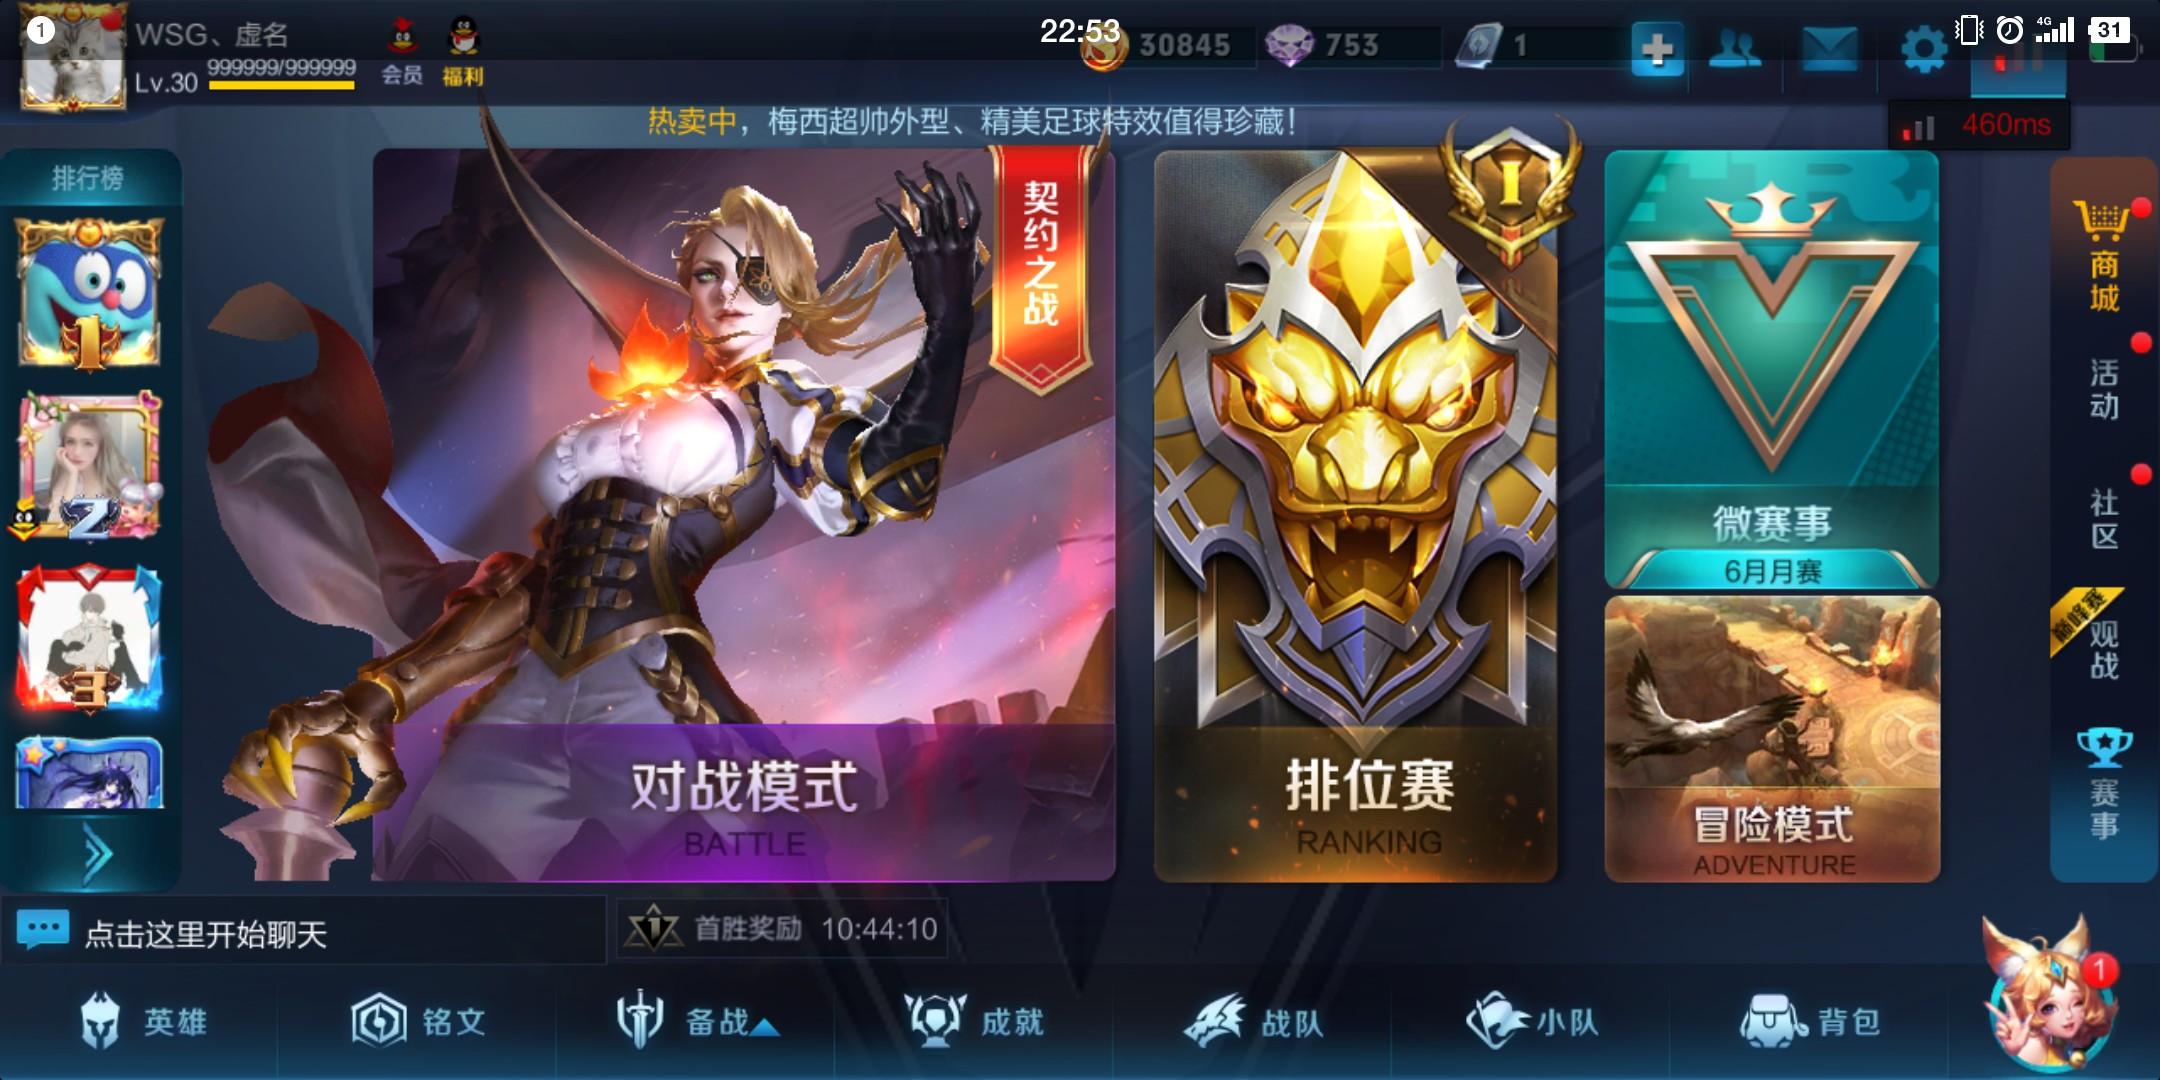 Screenshot_2018-06-14-22-53-34-921_????.png